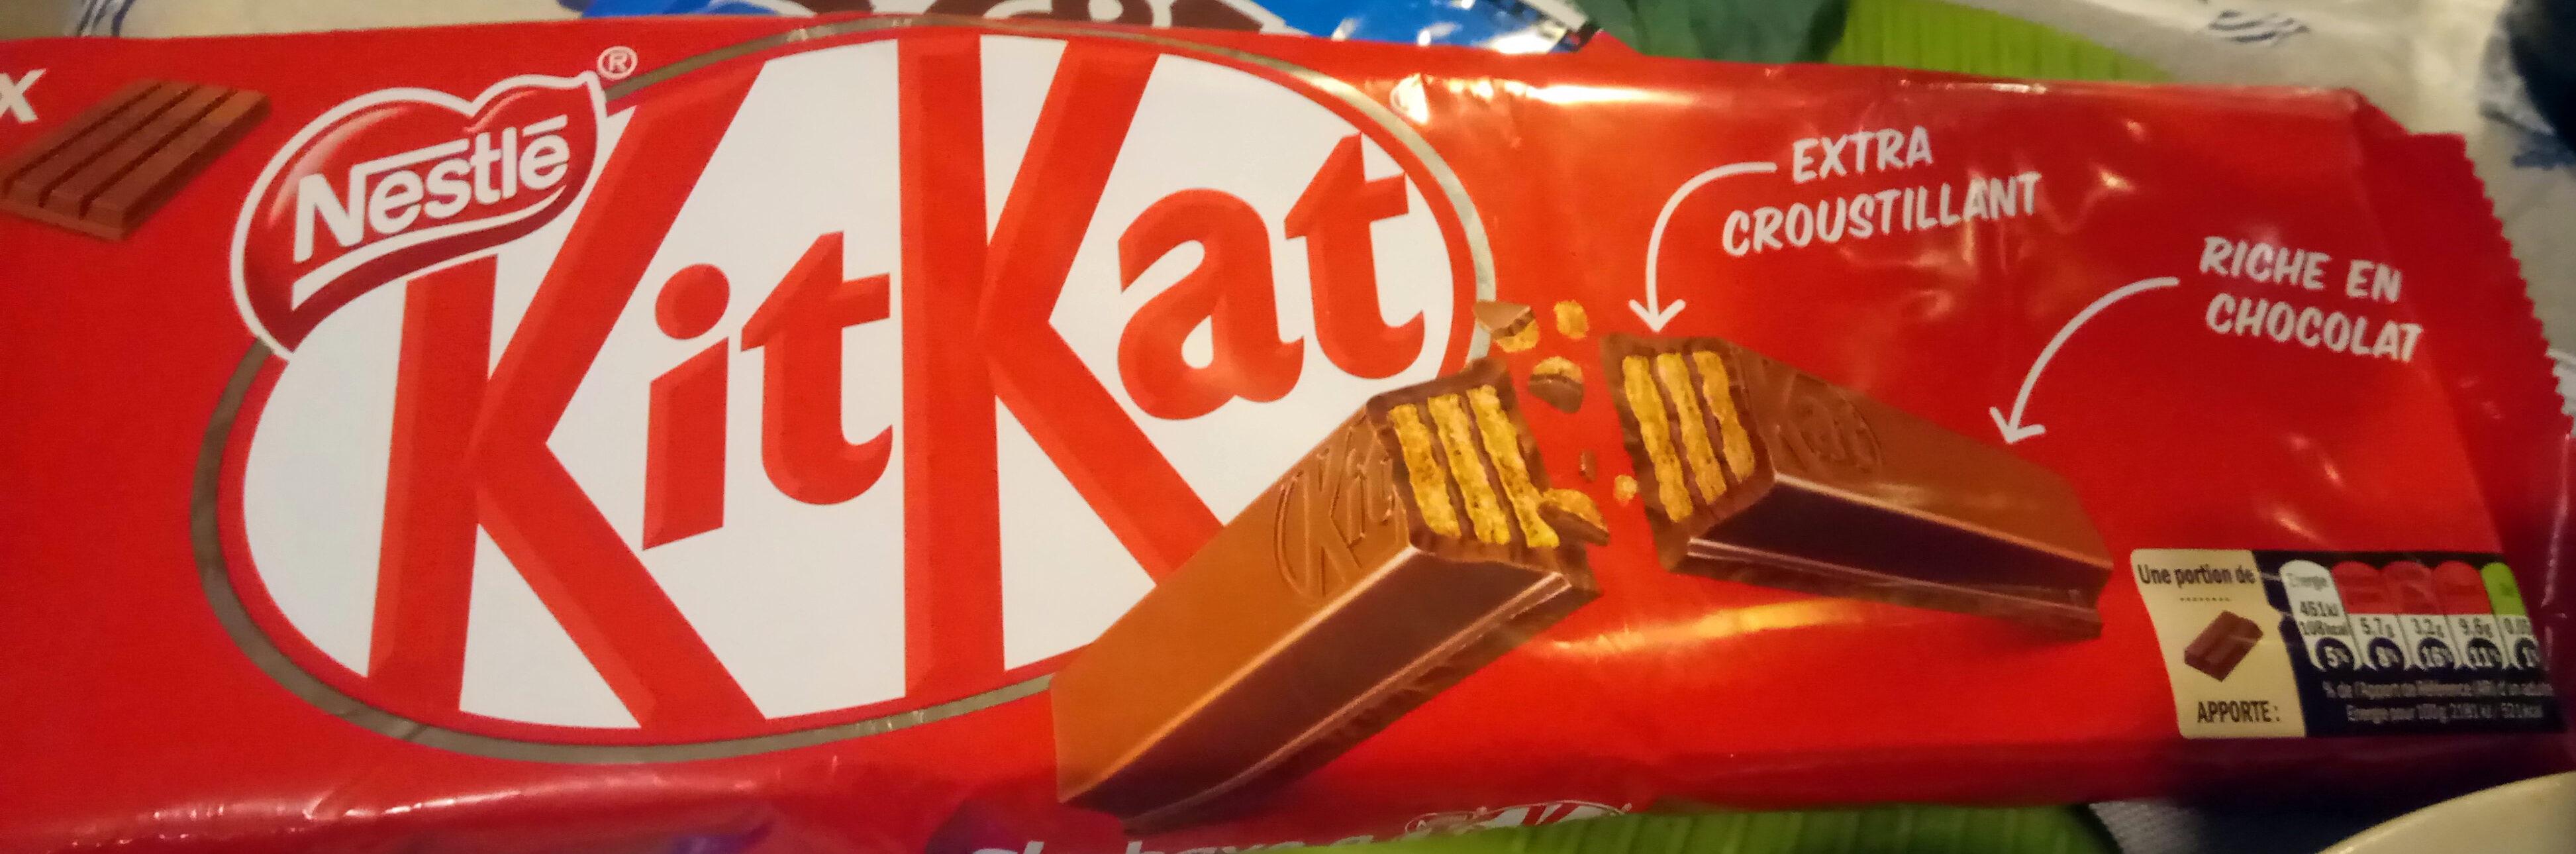 Kit Kat - Produkt - fr